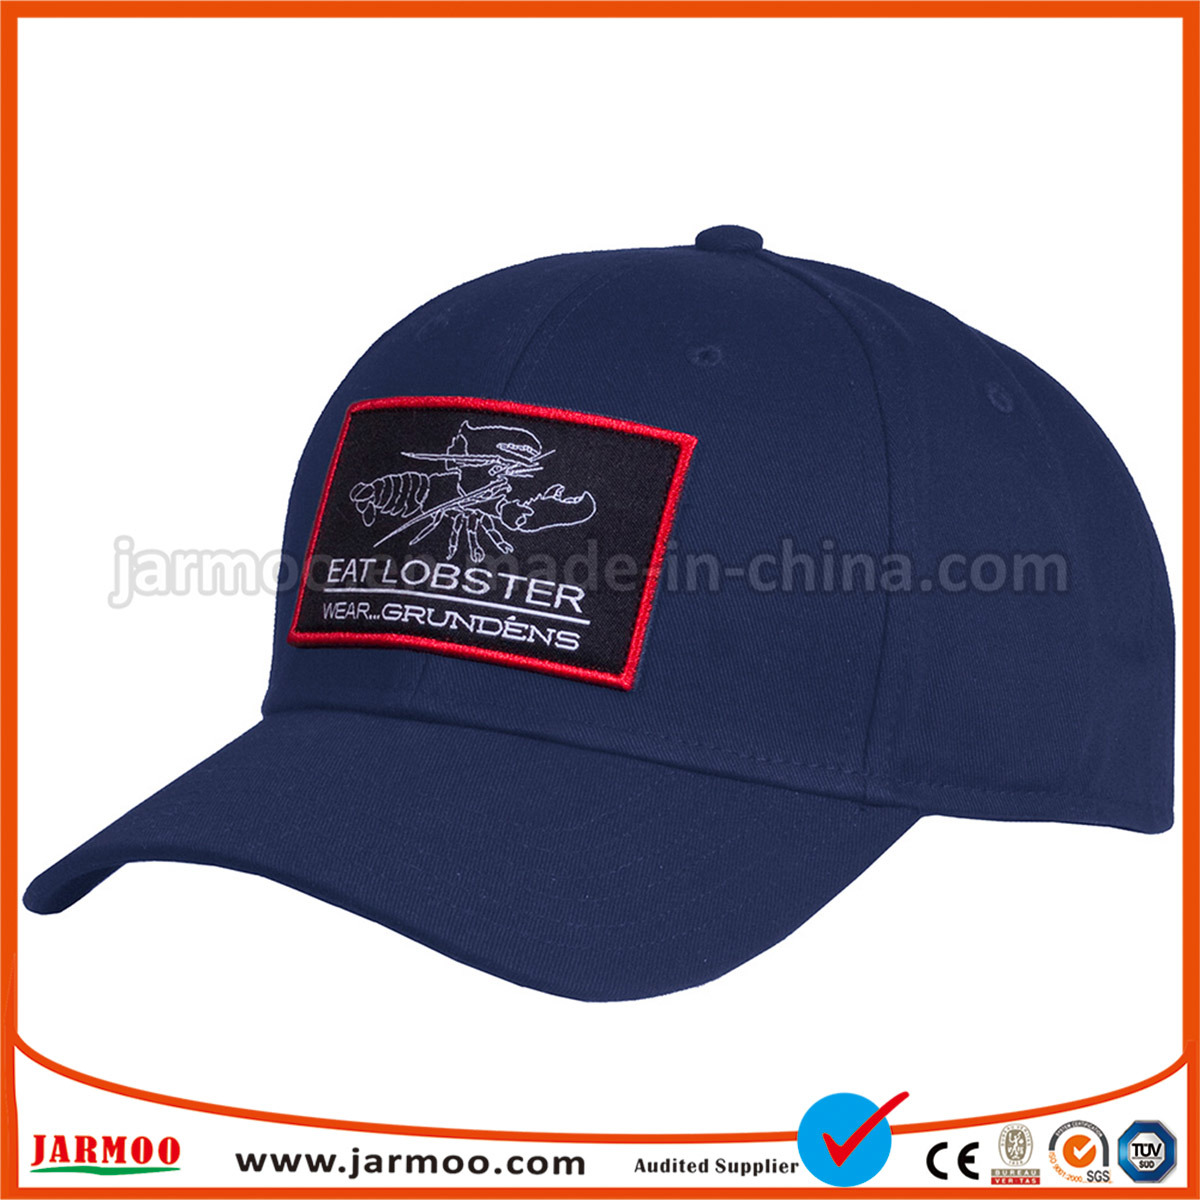 a74a55e623a China Custom Football Club Sports Hats with Embroidery Logo Photos ...